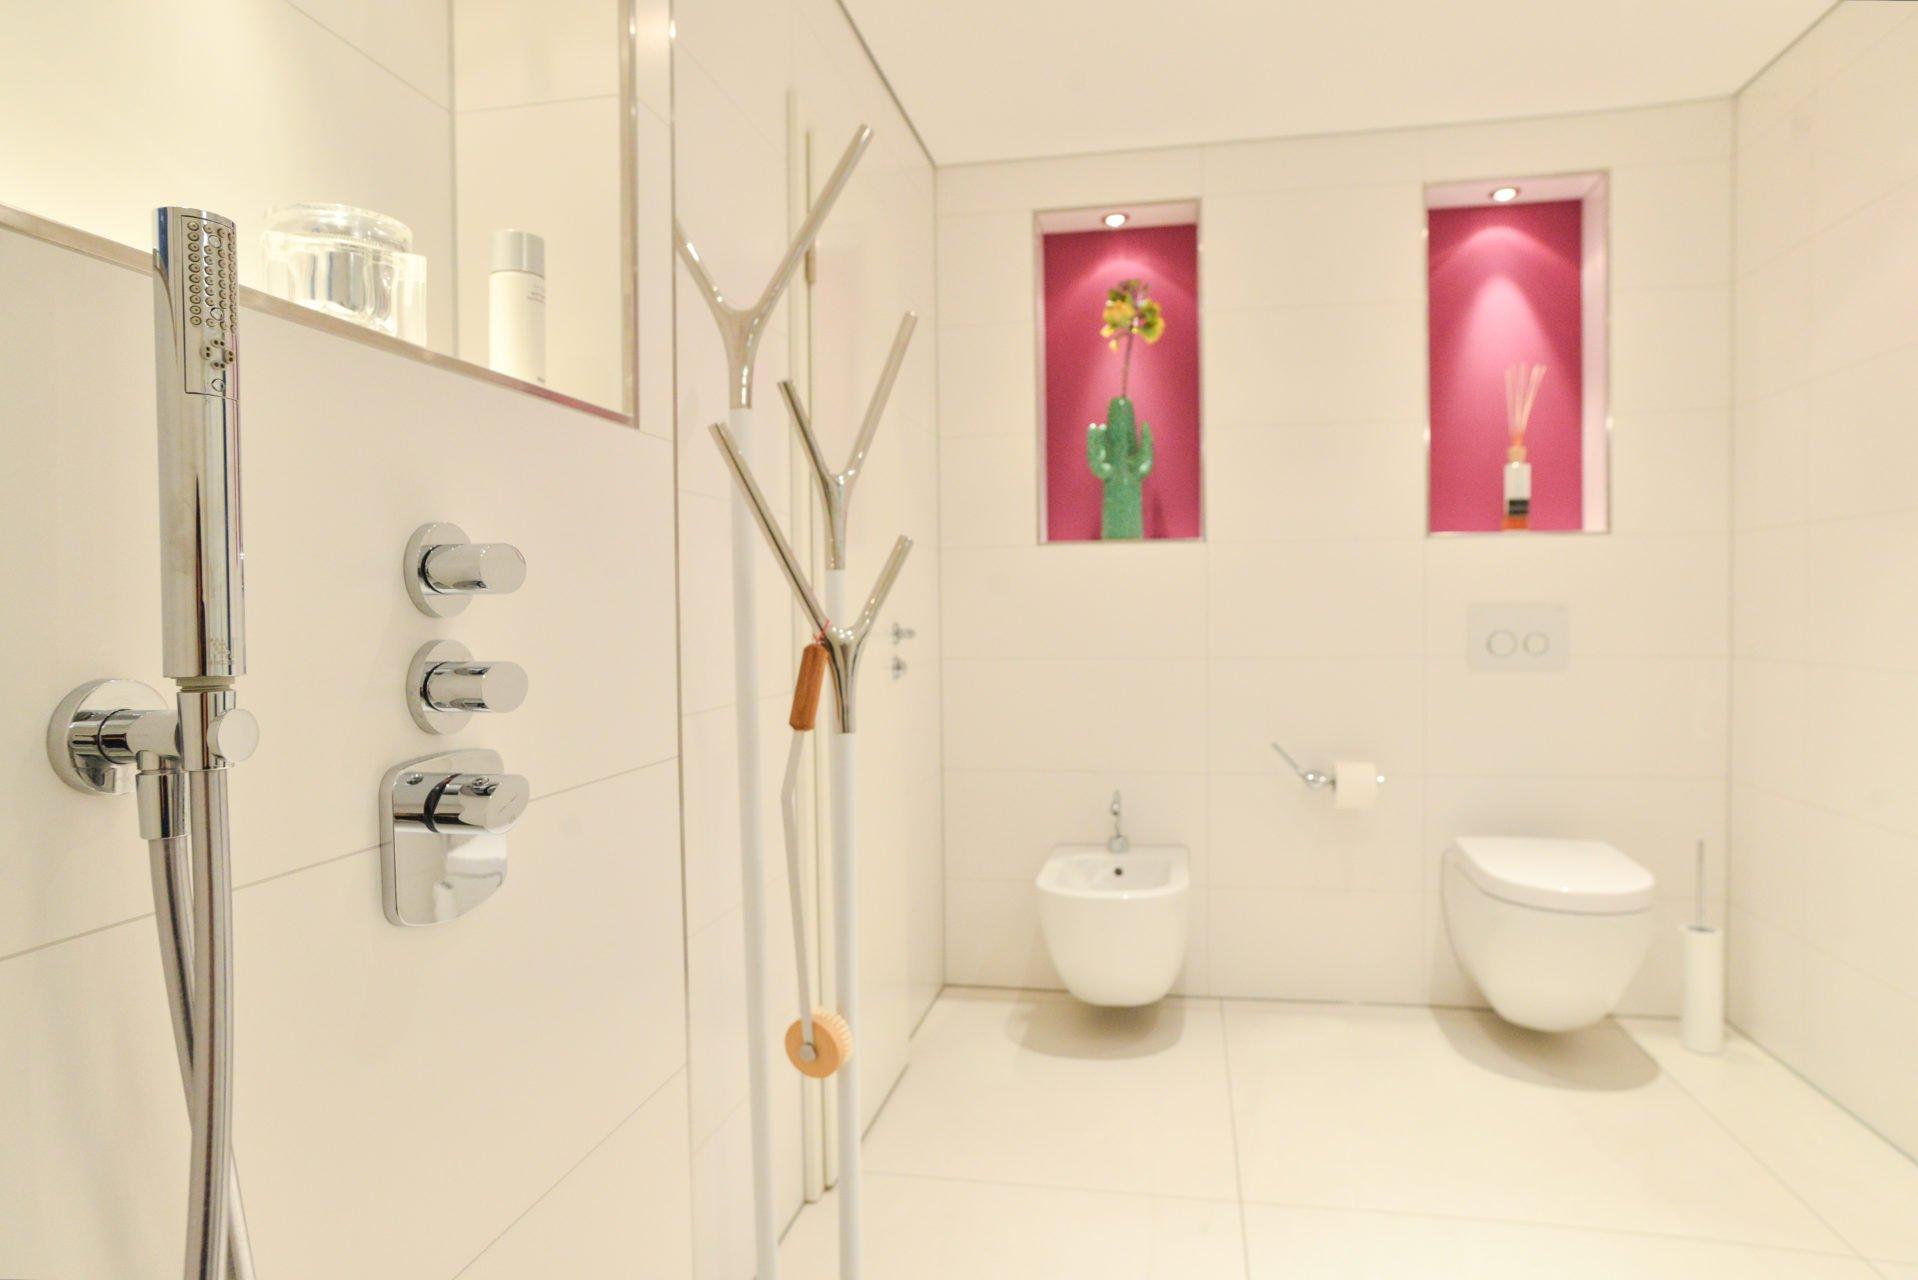 Badezimmer Pink Duscharmatur Toilette Wc Bidet Nowak Gmbh Bergisch